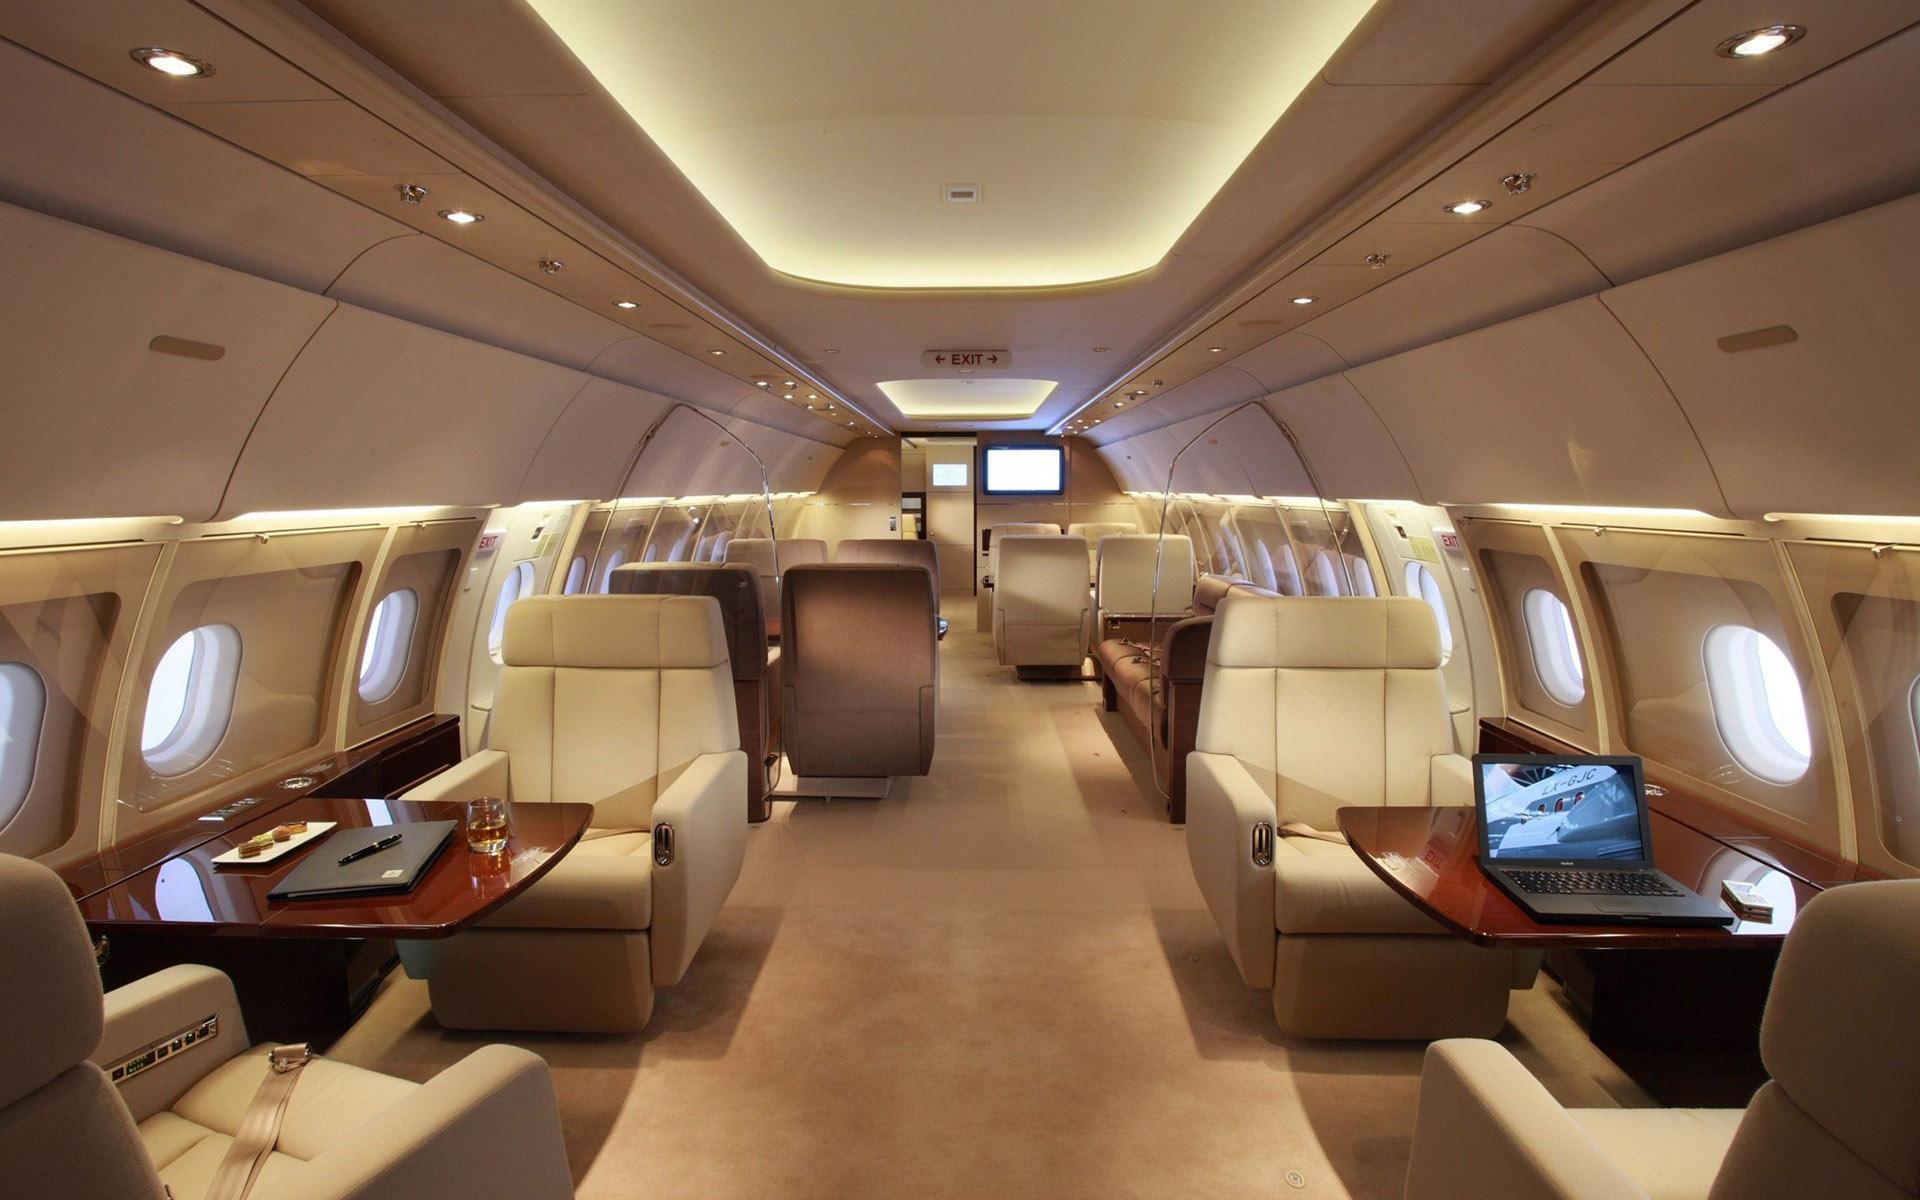 Luxury Airplanes